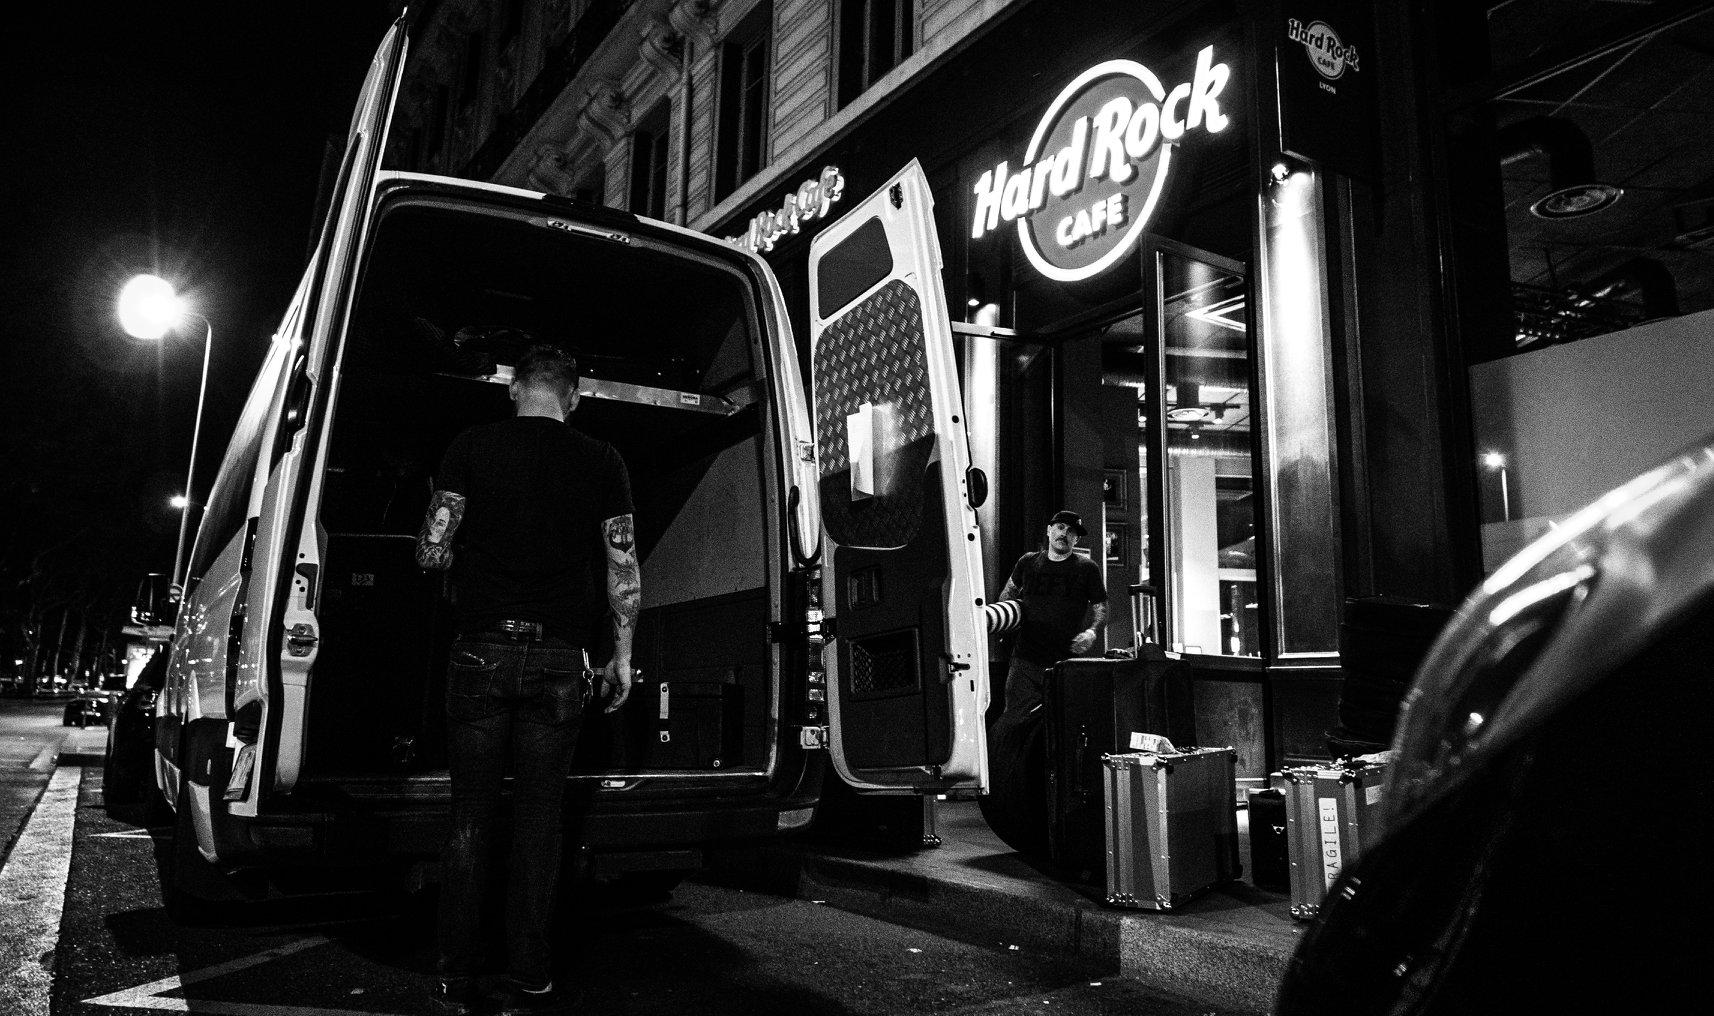 Outside Hard Rock Cafe. Lyon, France.